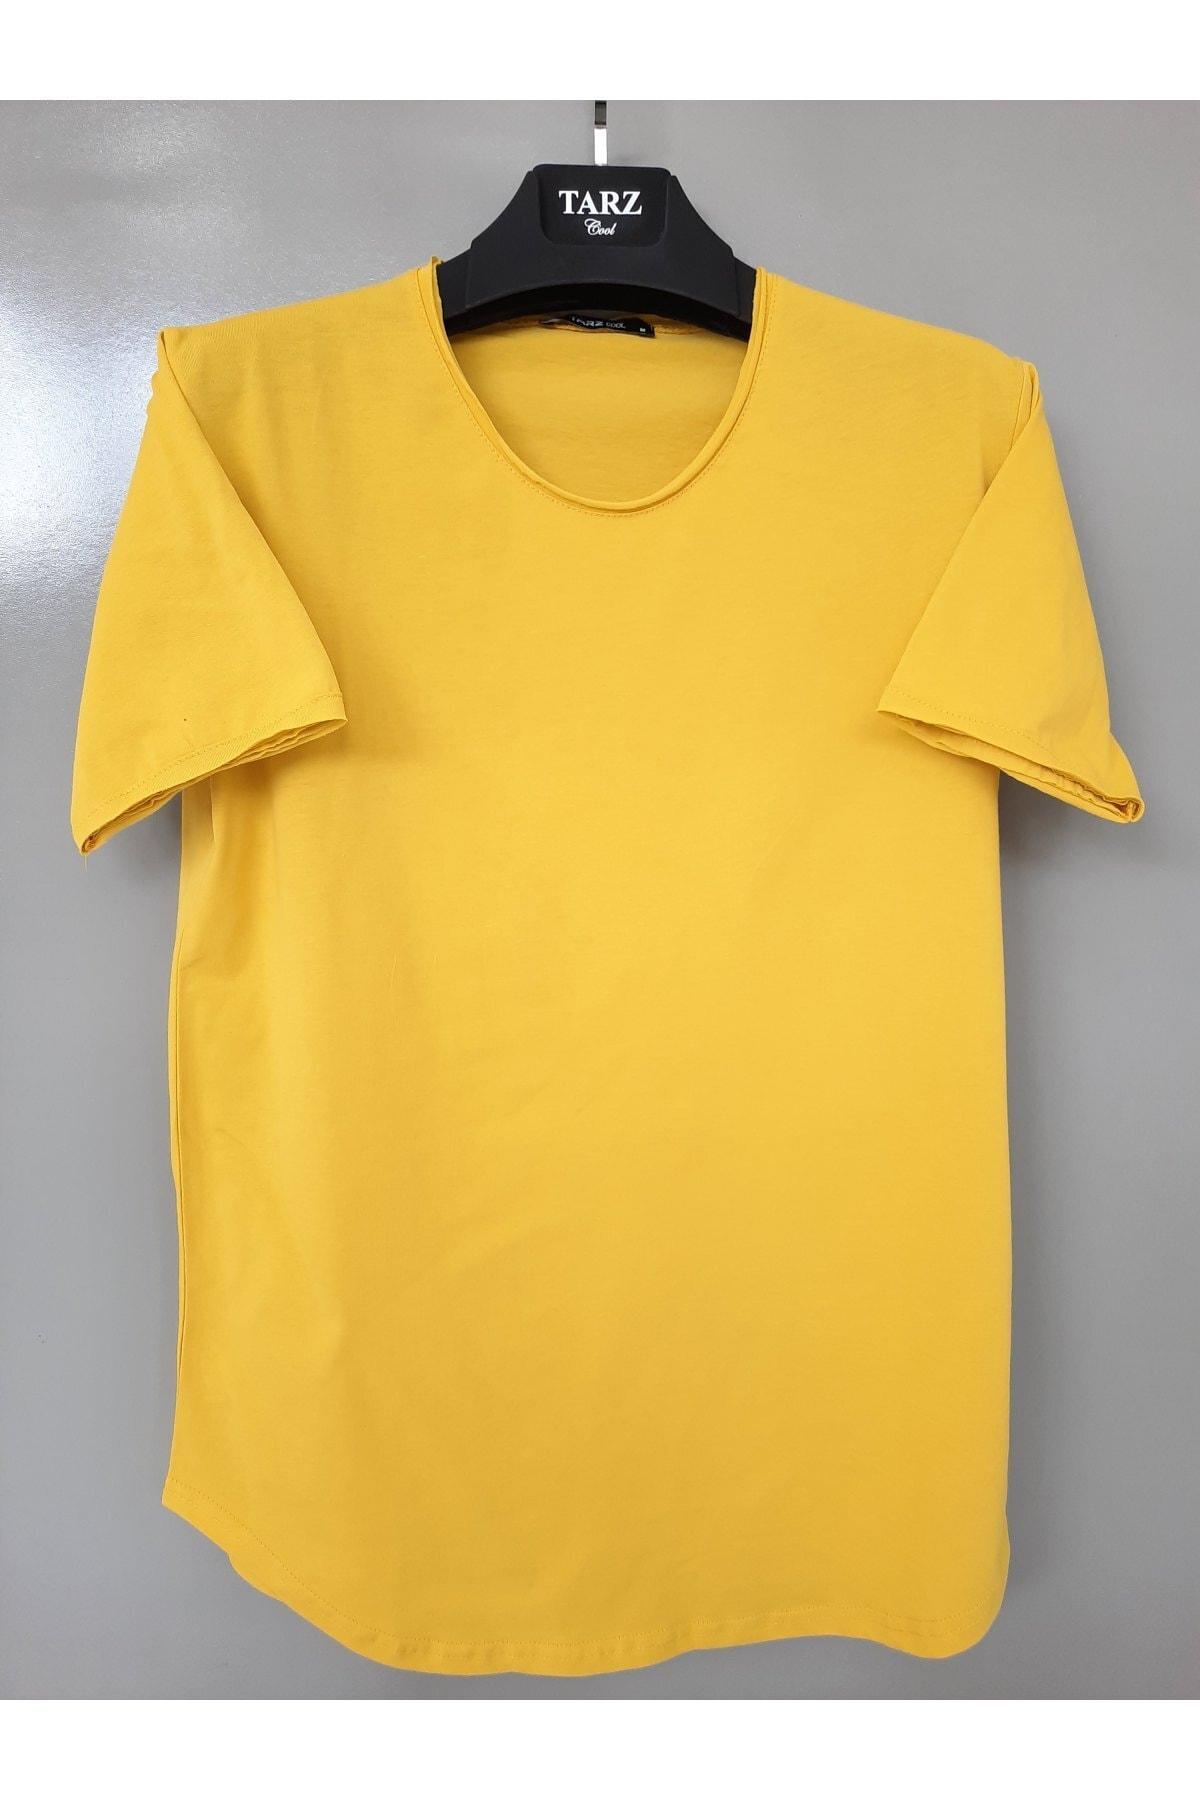 Erkek Yağ Yeşili Pis Yaka Salaş T-shirt